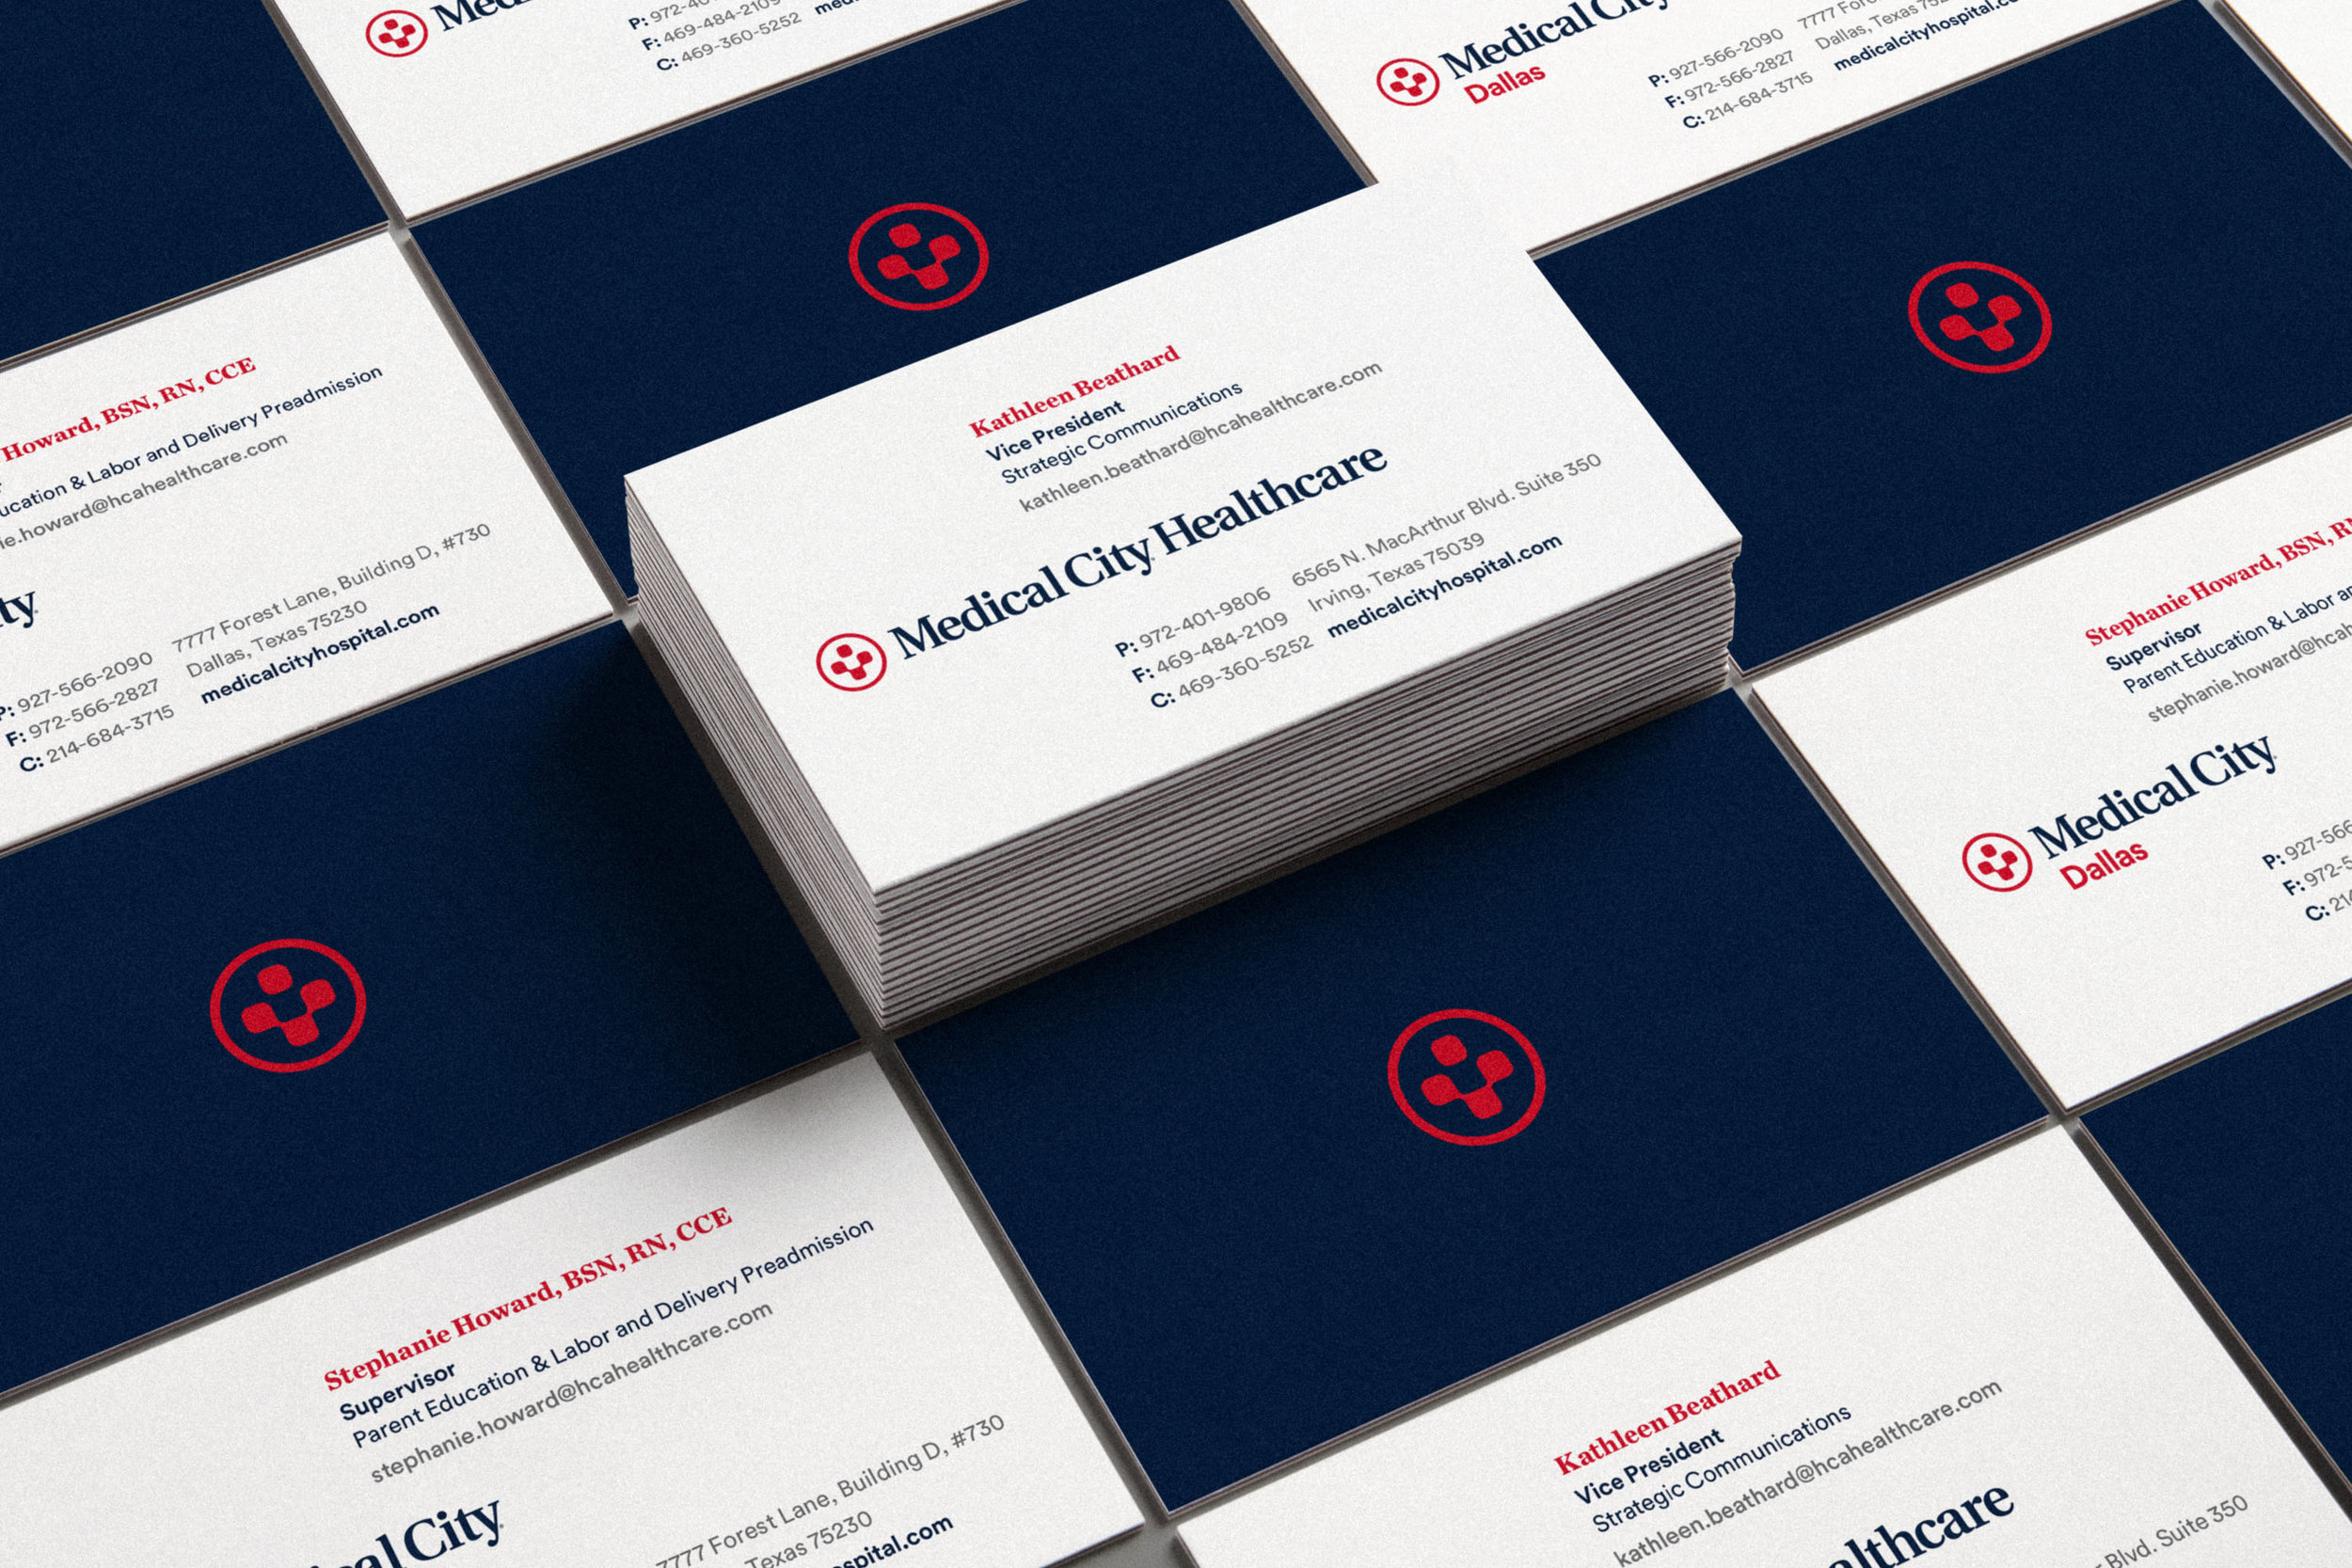 ronaldvillegas-medical-city-business-cards.jpg